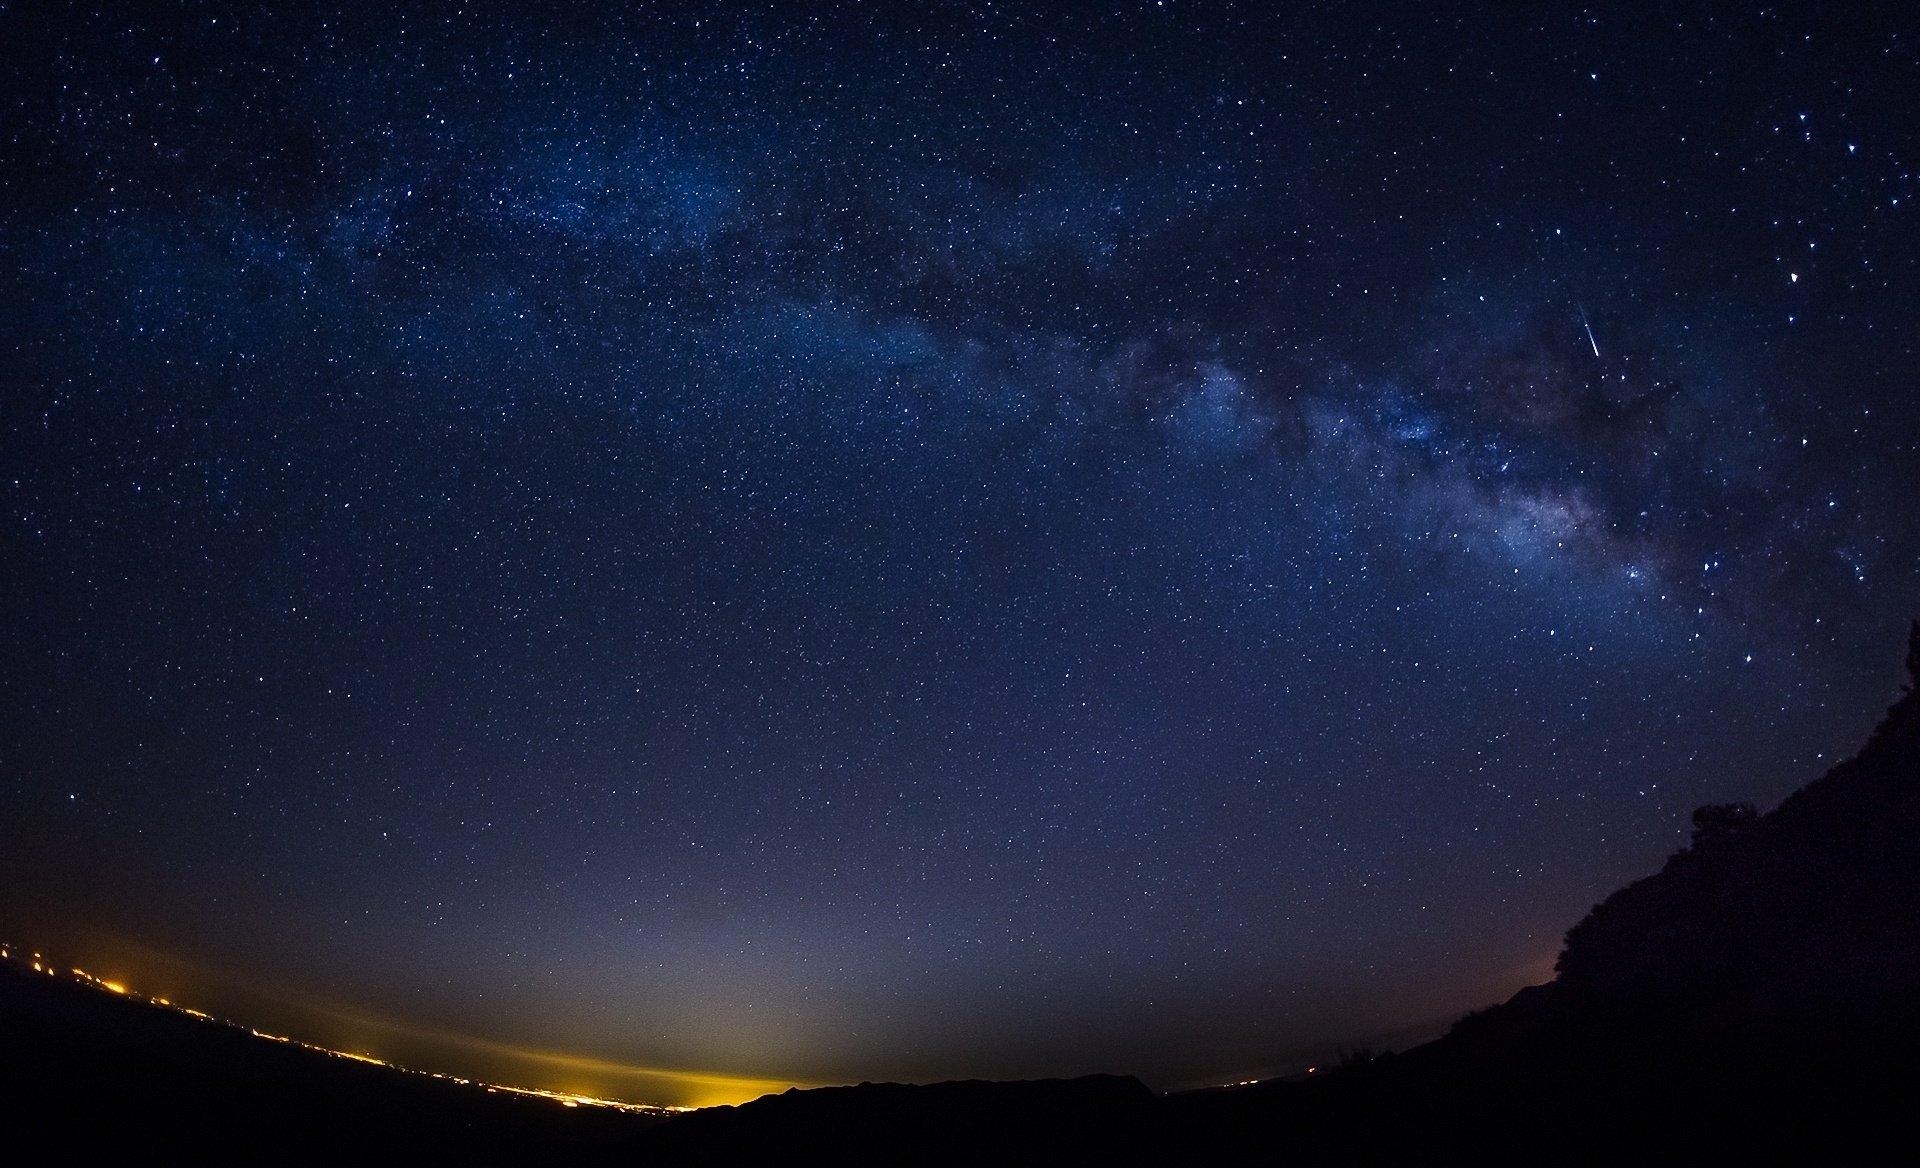 Night sky stunning hd desktop wallpapers 4k hd for Night sky wallpaper 4k